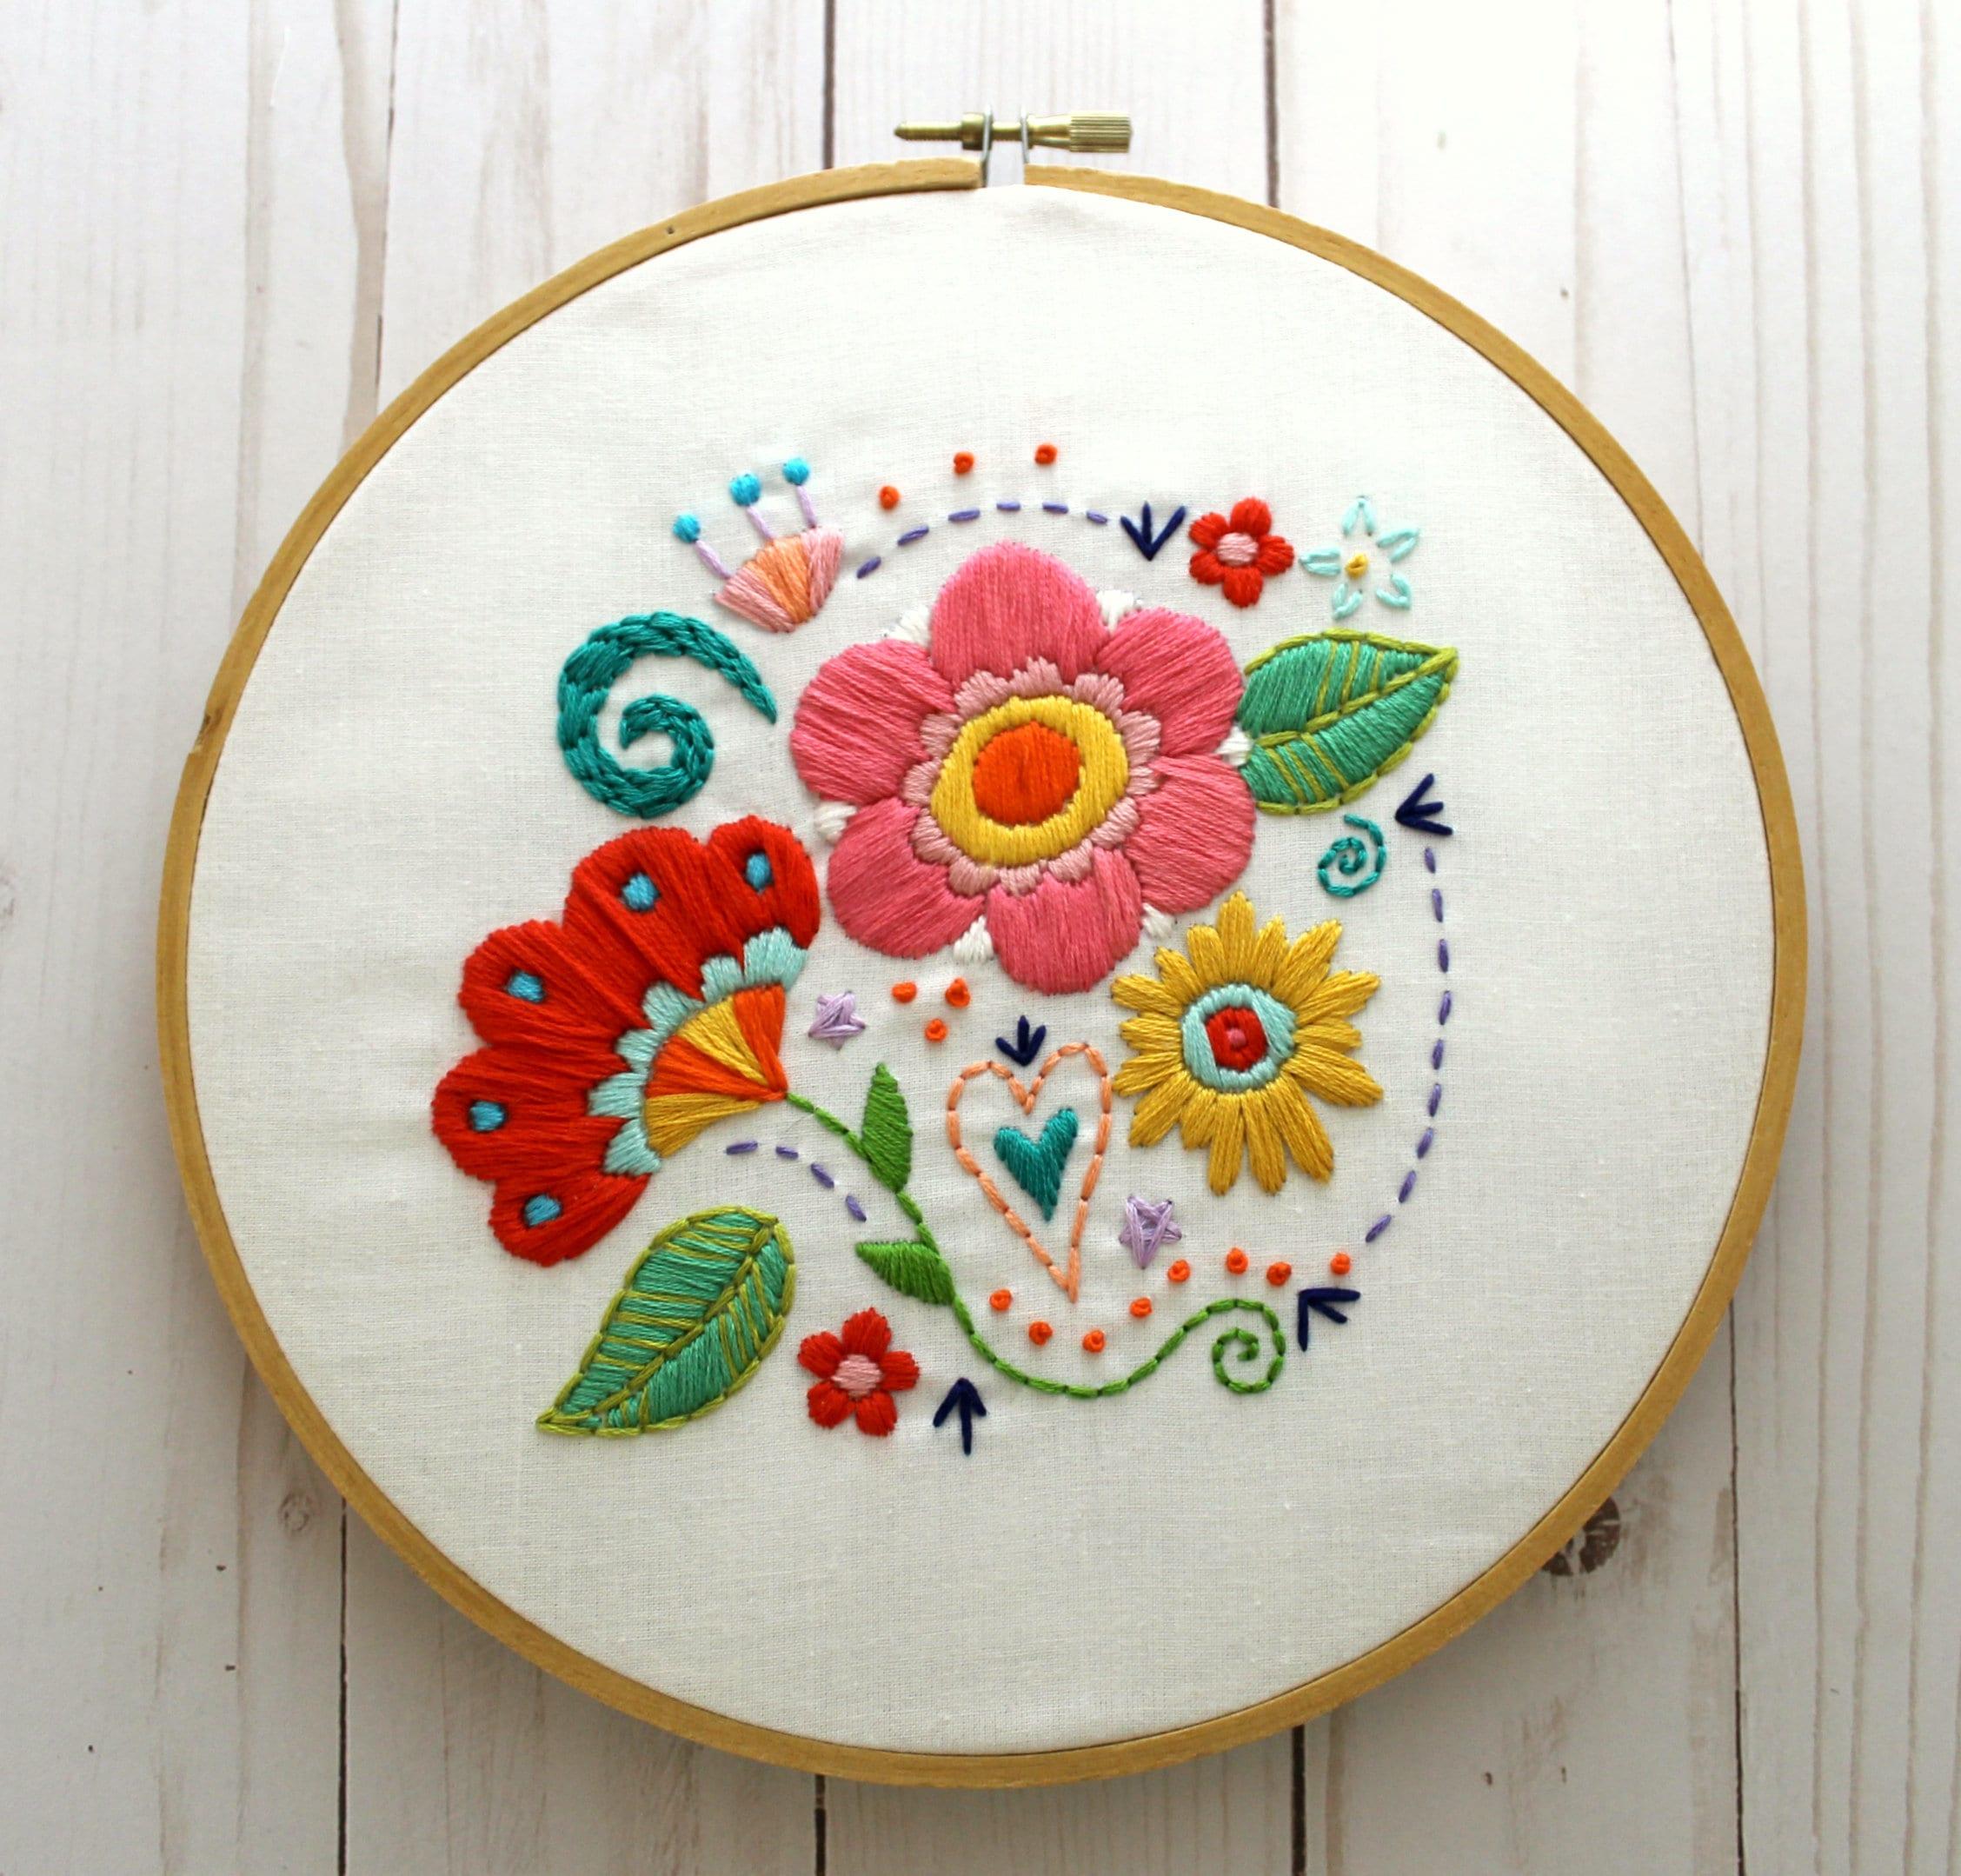 Flower Embroidery Pattern. Floral Embroidery Design. Hand Embroidery. PDF  Pattern. Hoop Art. Retro Modern. Boho Flowers. Flower Pattern.